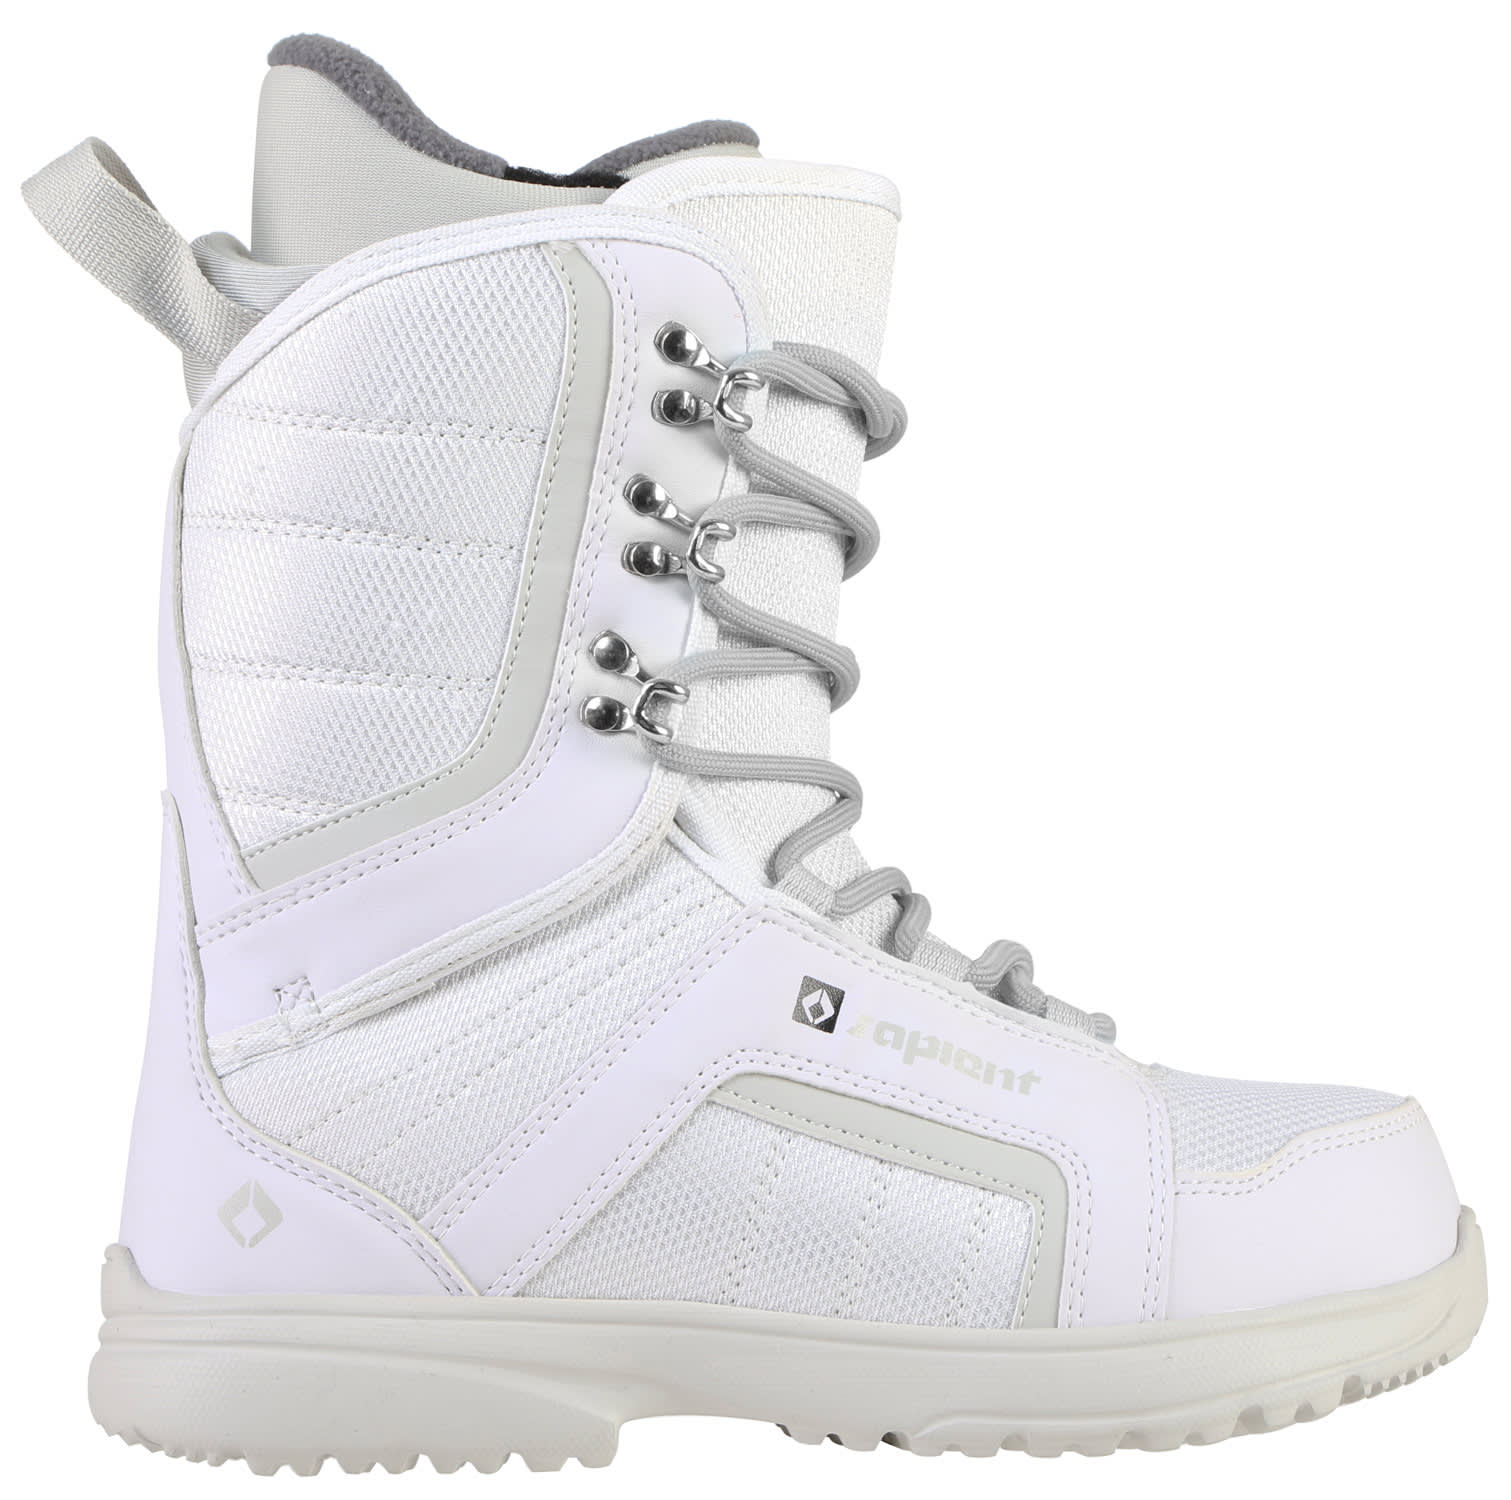 Sapient Zeta Snowboard Boots